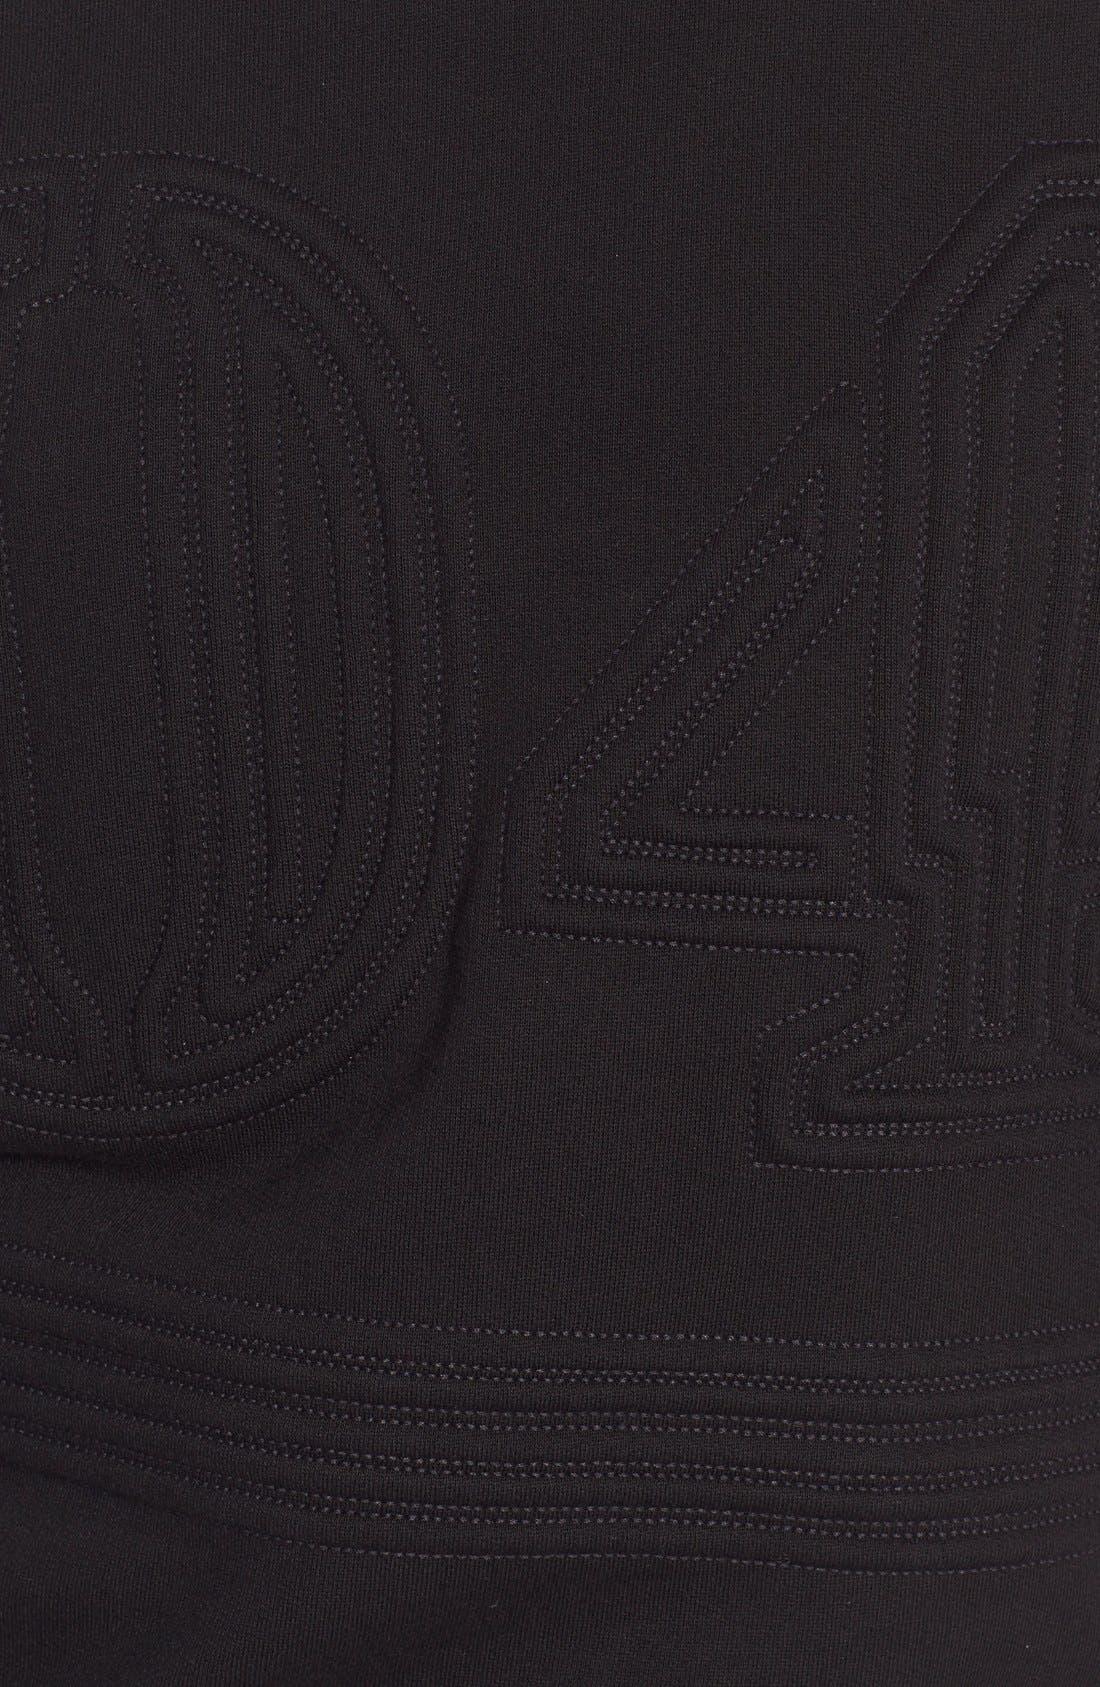 Corded 04 Sweatshirt,                         Main,                         color, 001